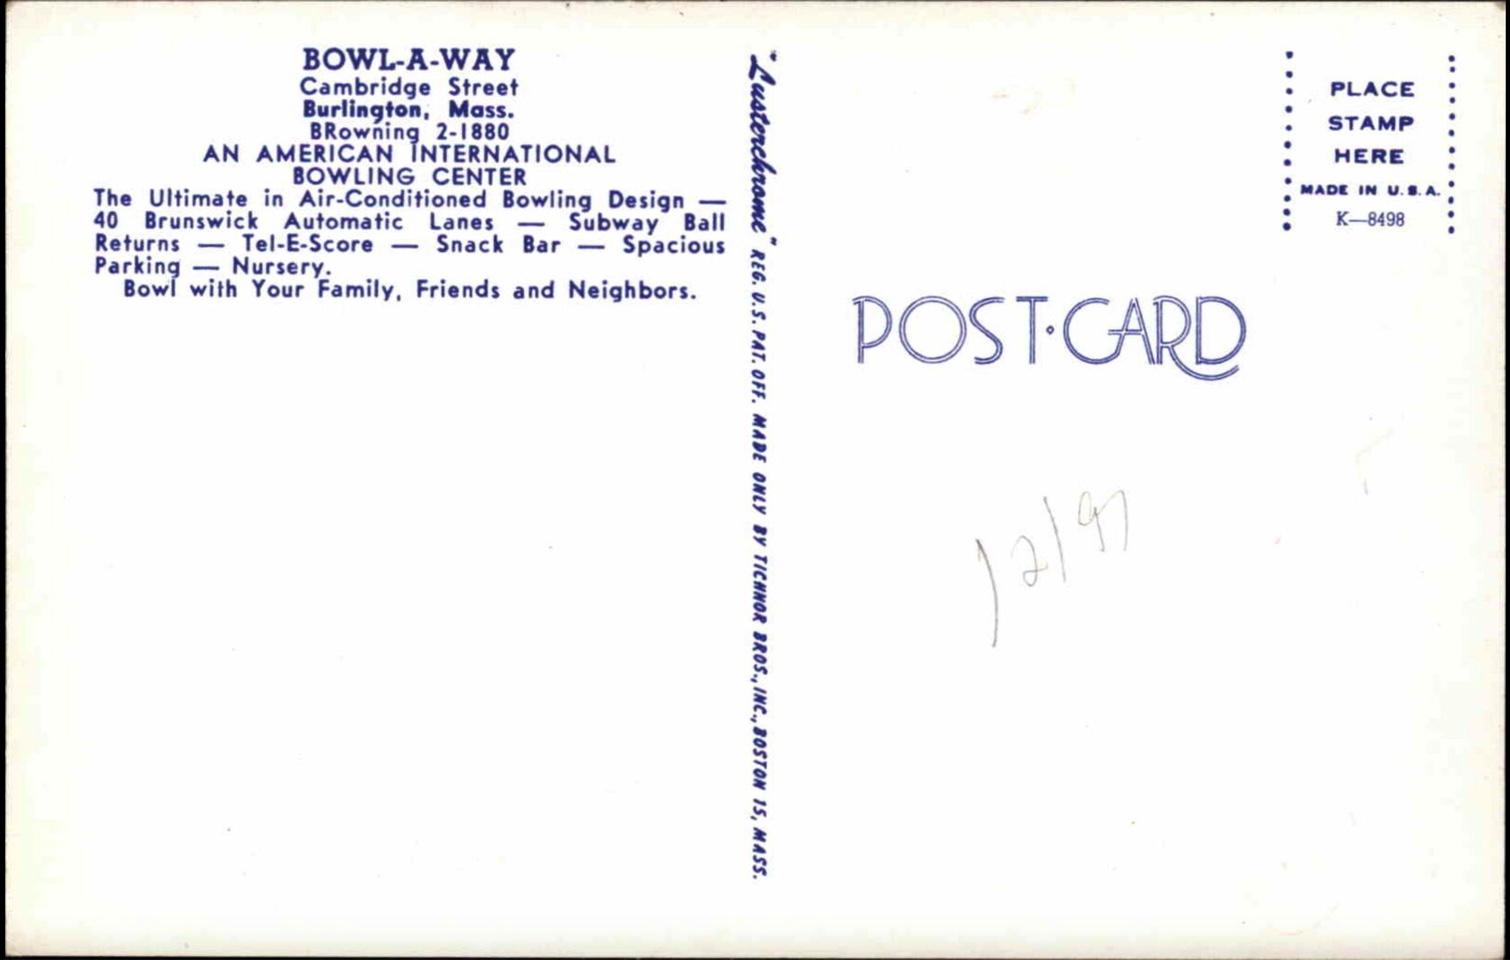 Bowl-A-Way Burlington, MA postcard reverse side